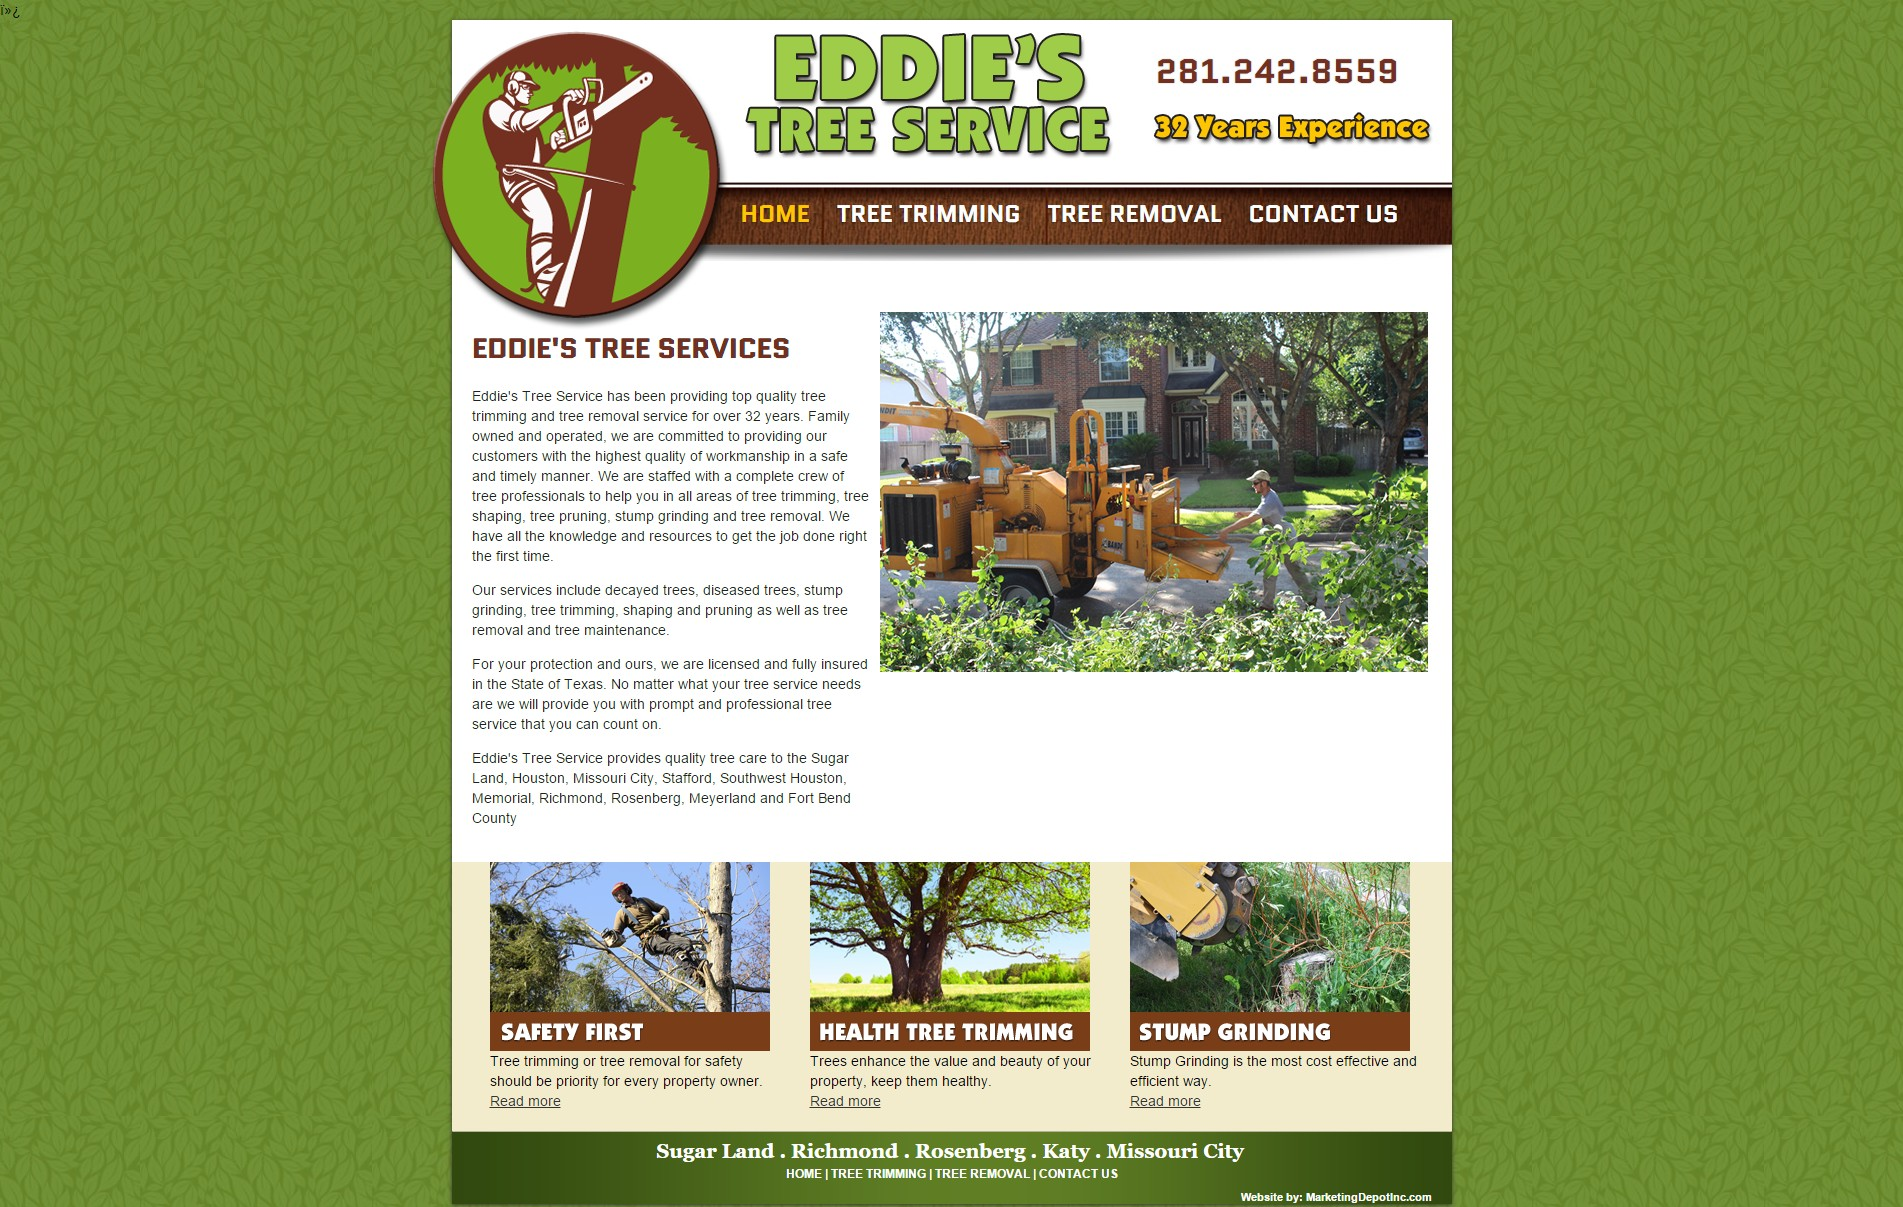 Eddie's Tree Service